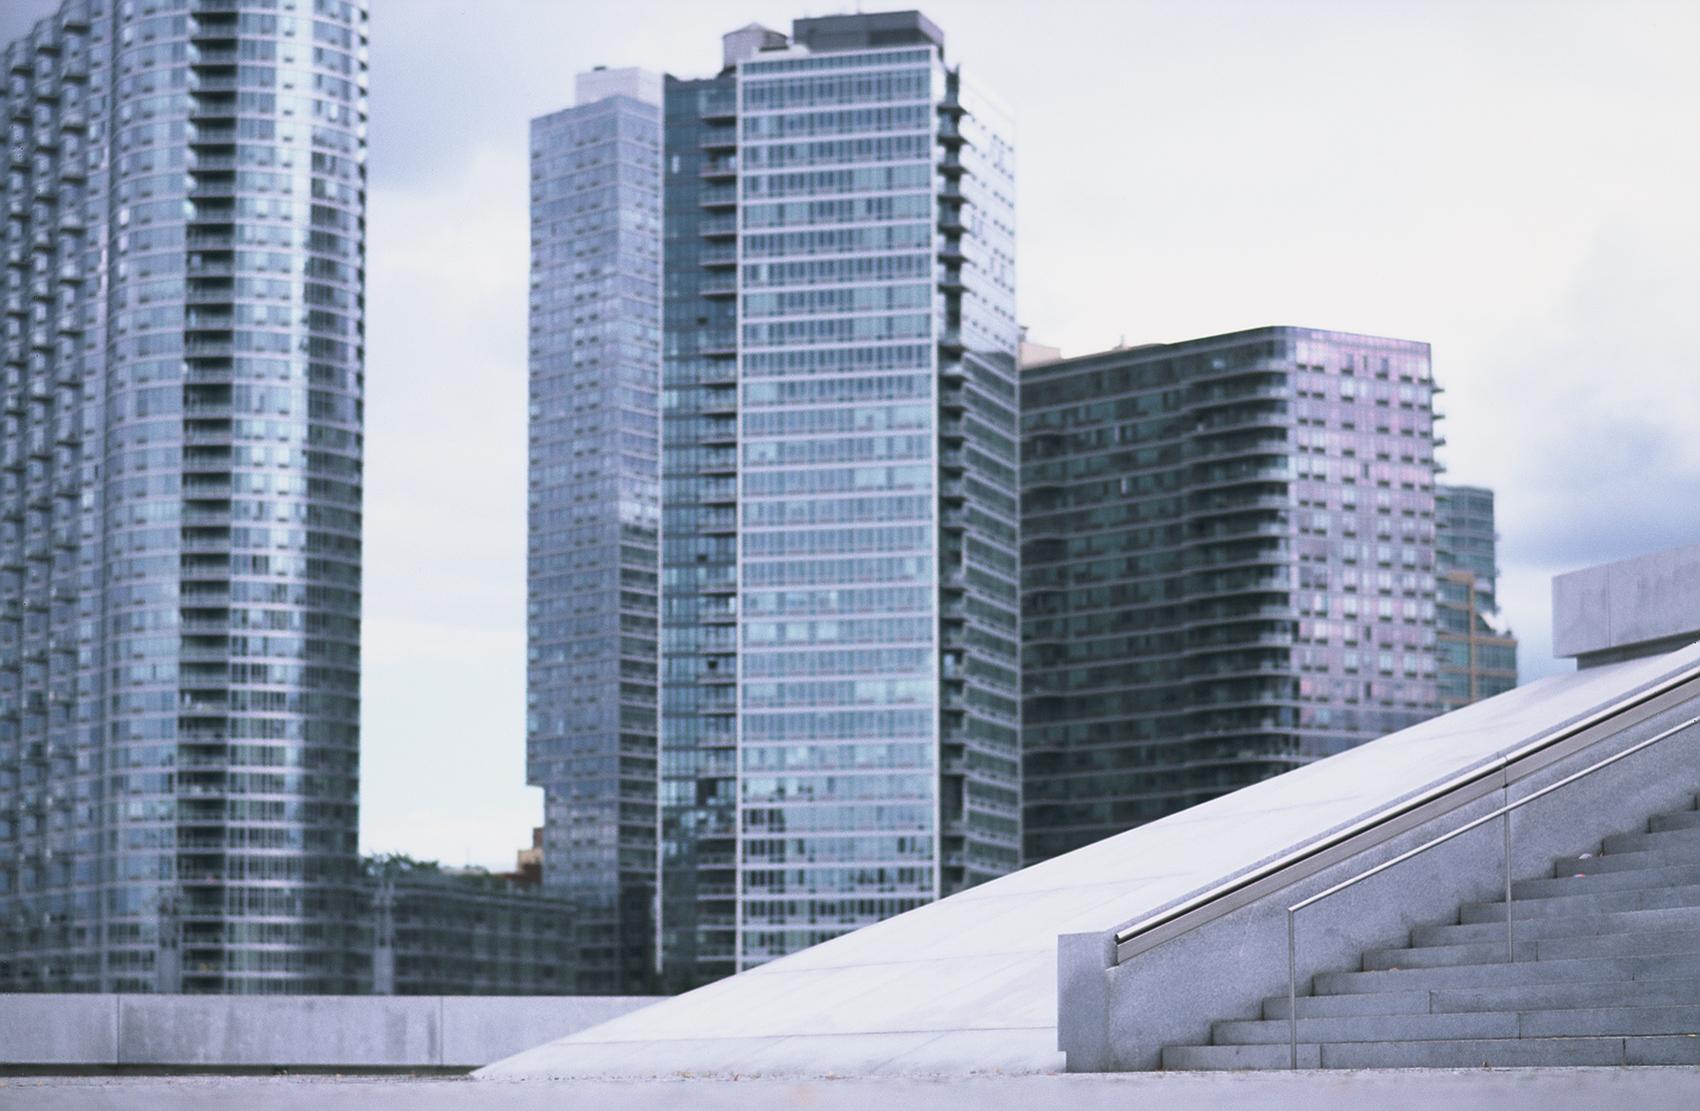 New York, New York, USA   Nikon FM2